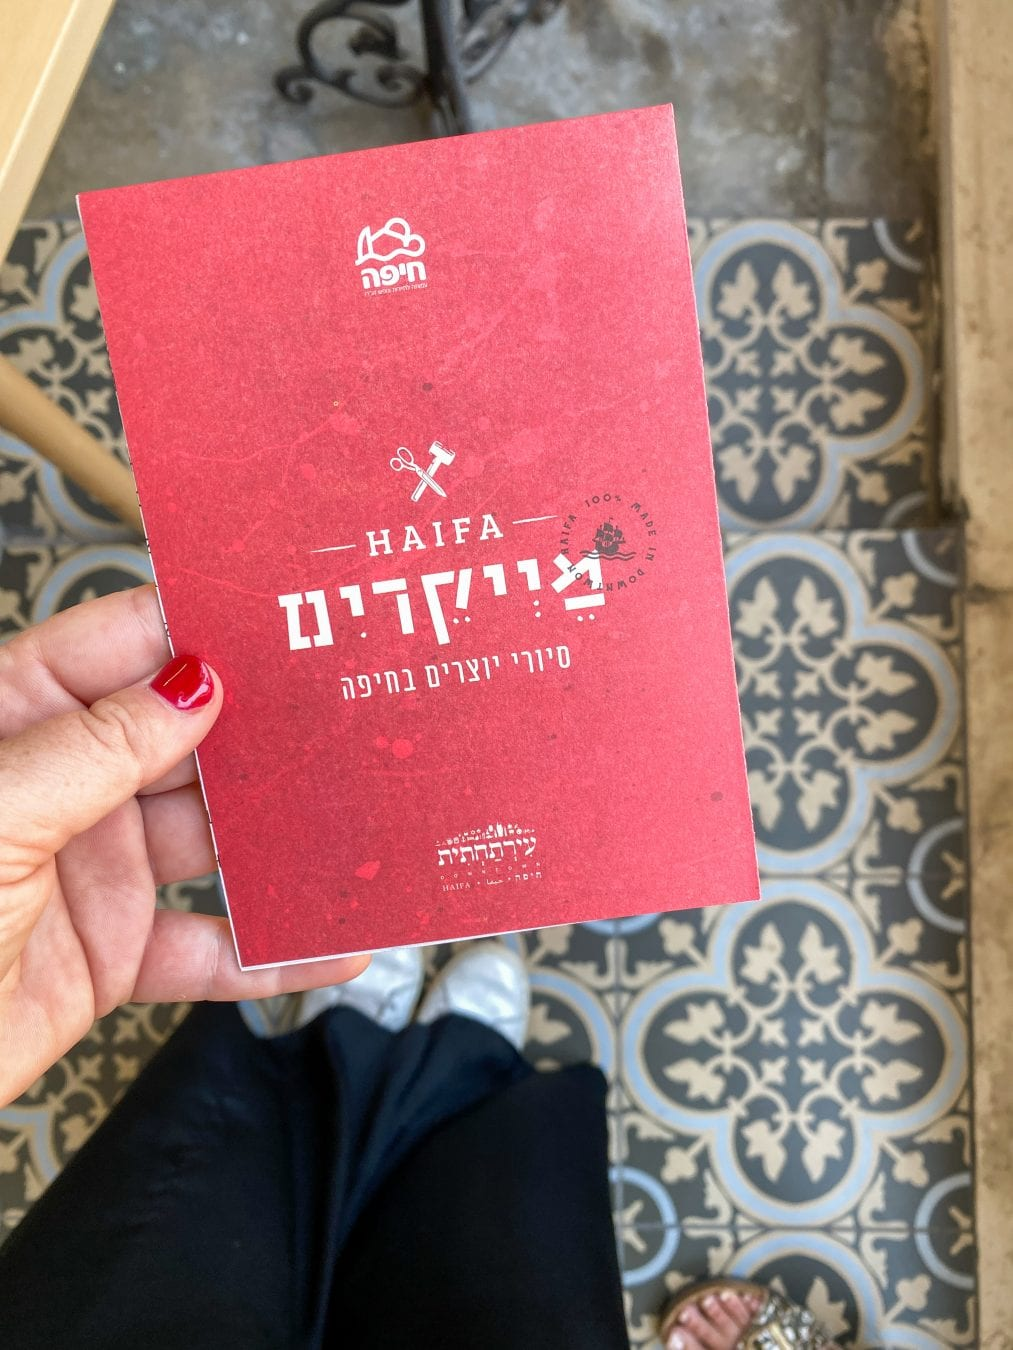 haifa city makers tour co founder & host